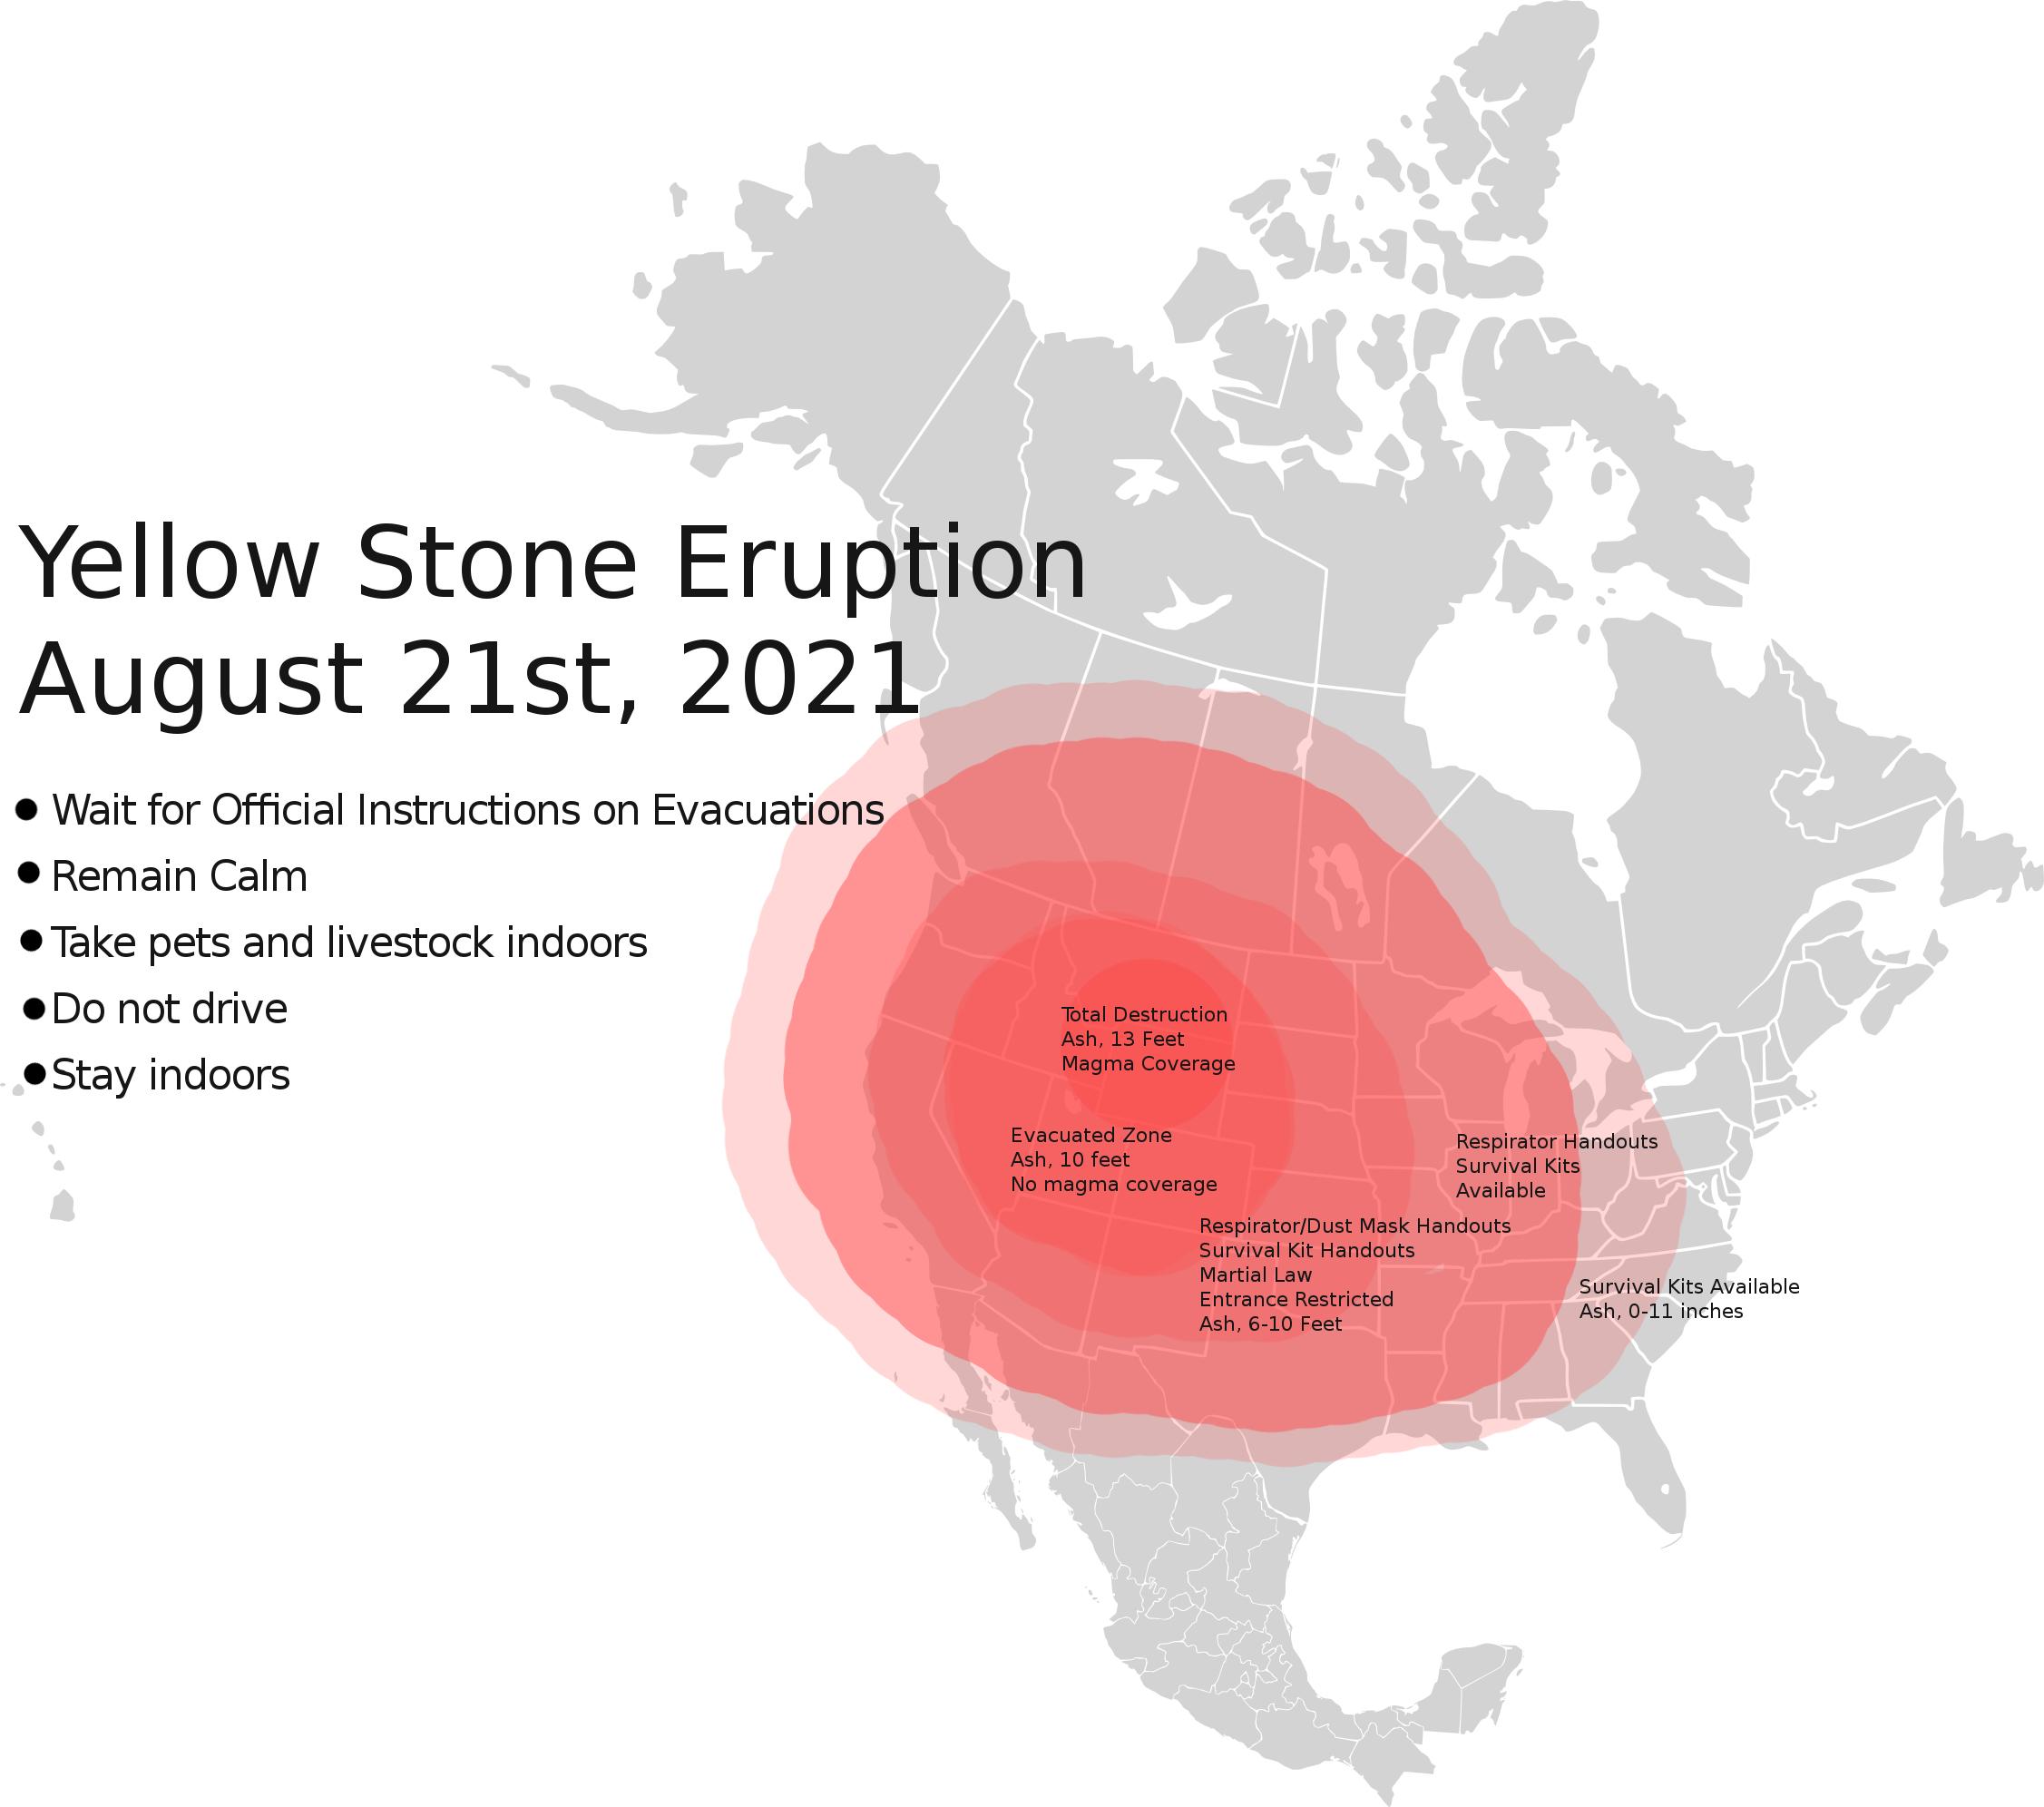 Yellowstone Eruption of 2021 by Mister-Ed-Fan on DeviantArt